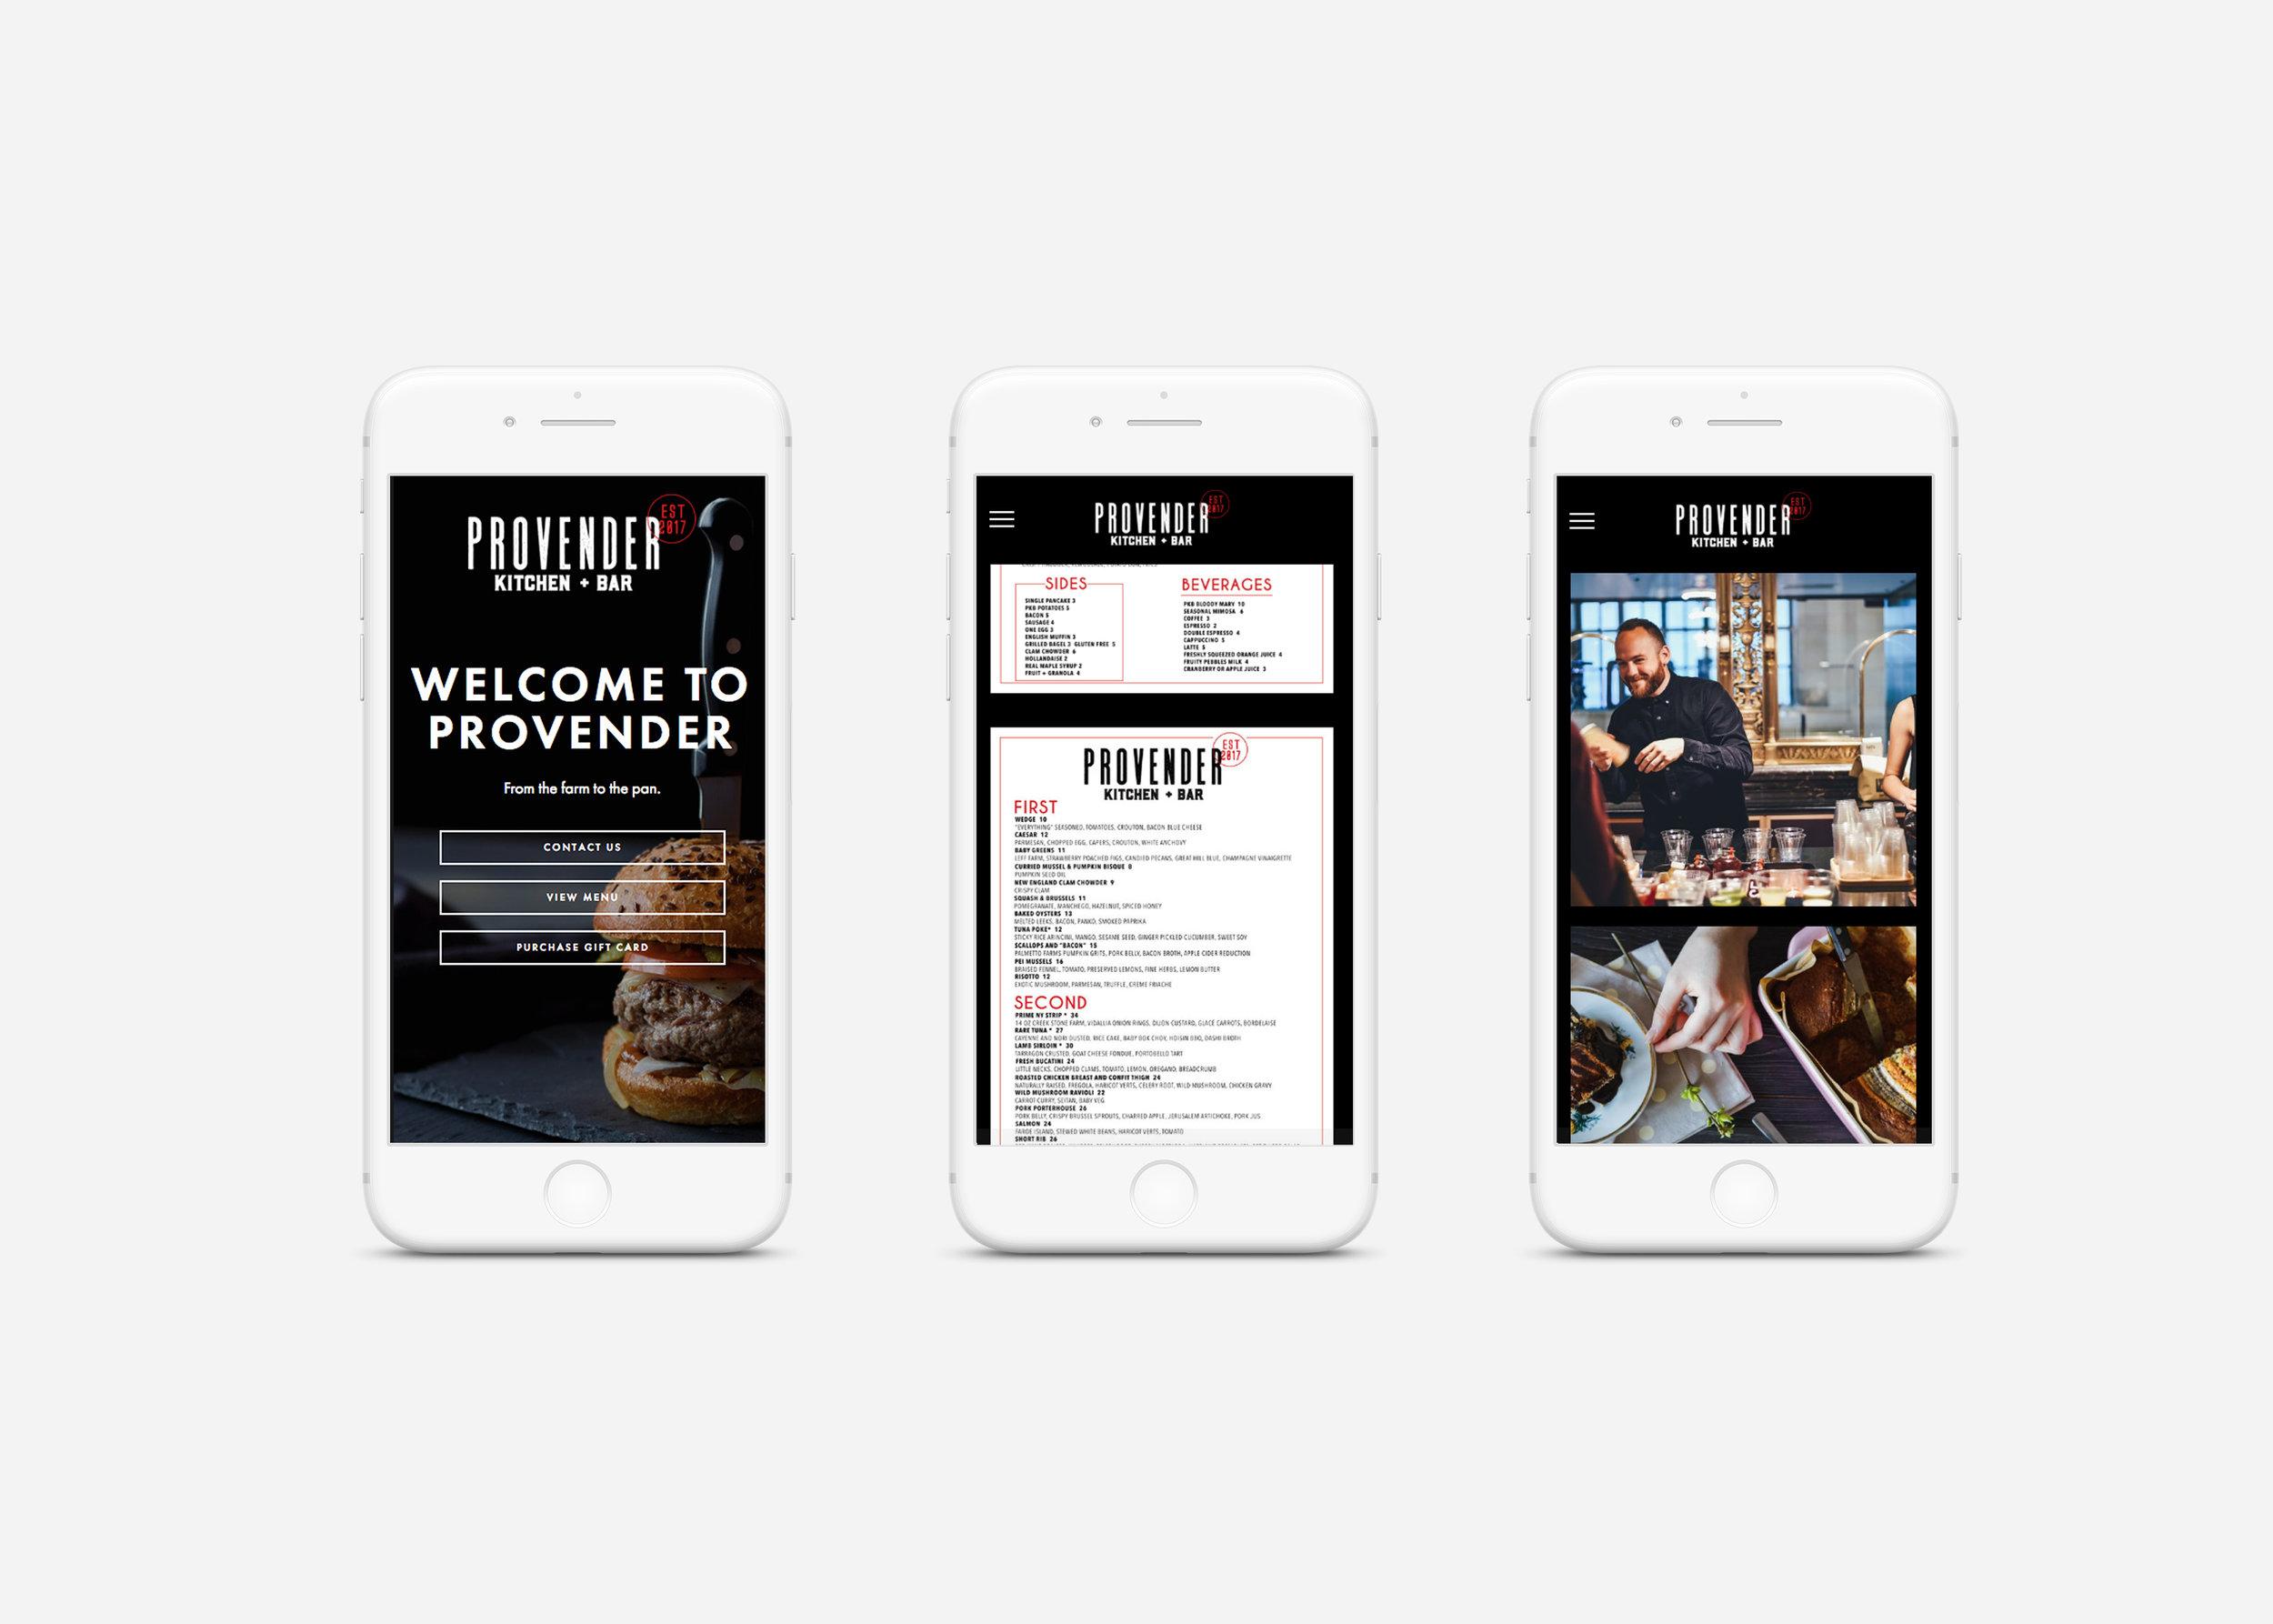 iPhone-Clay-White-Frontal-Free-Mockup.jpg